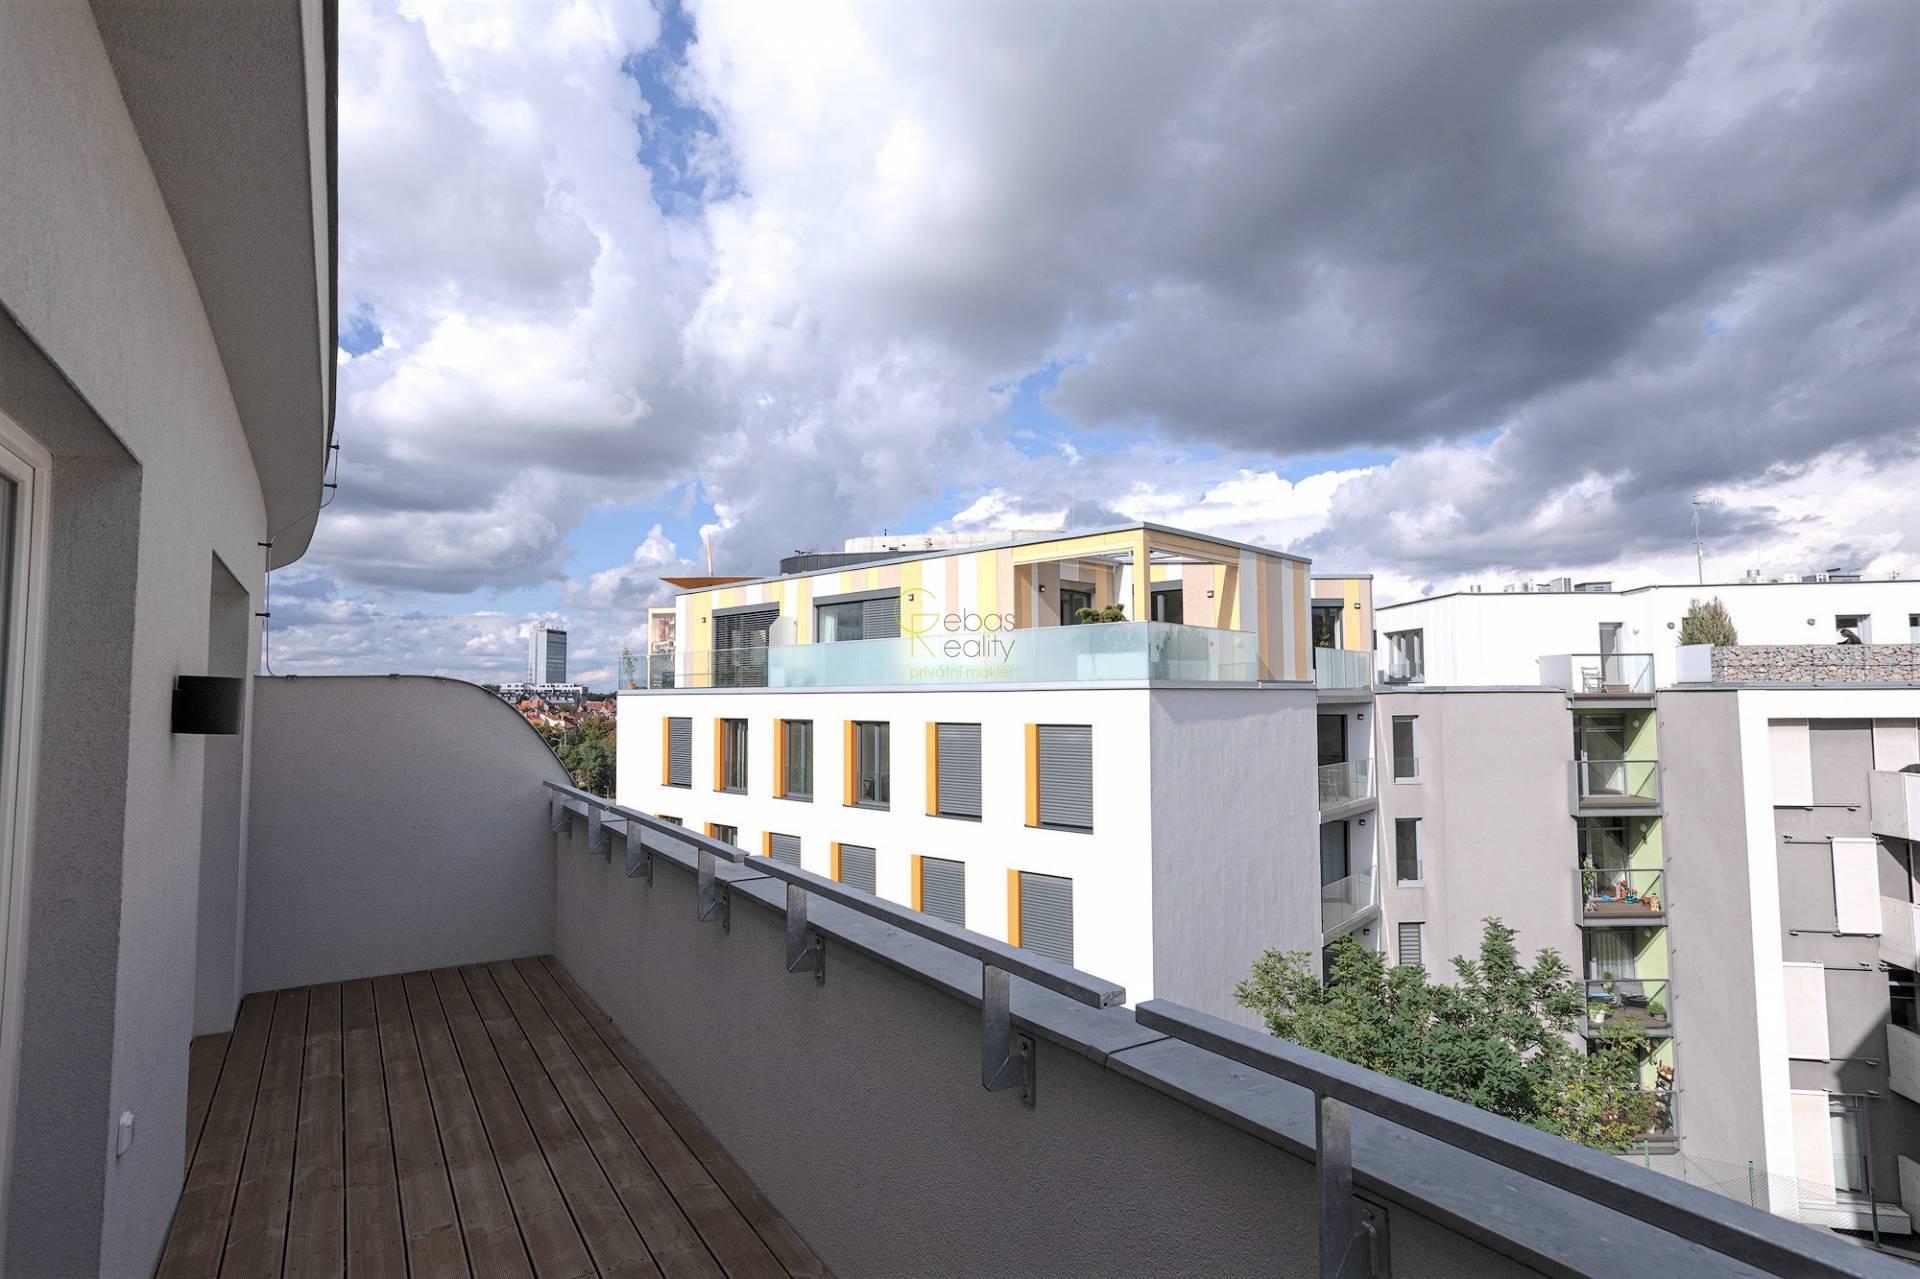 vybavené 2+KK s balkonem - ul.Veleslavínská, Praha 6